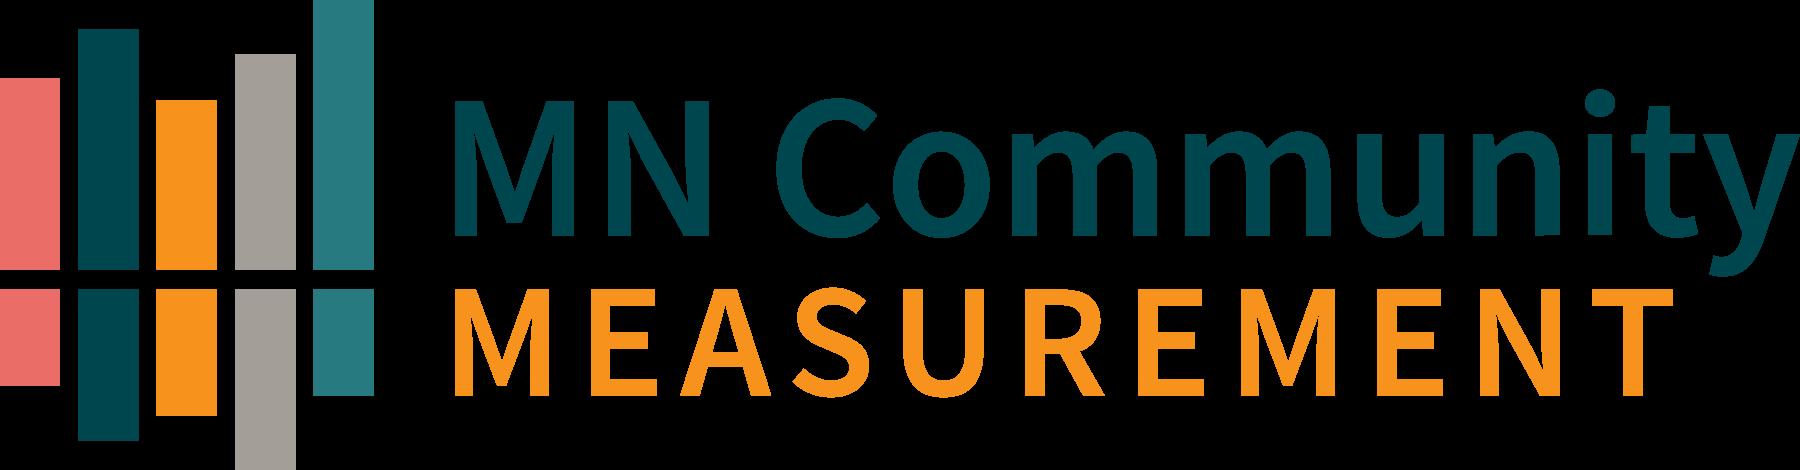 MN Community Measurement Logo